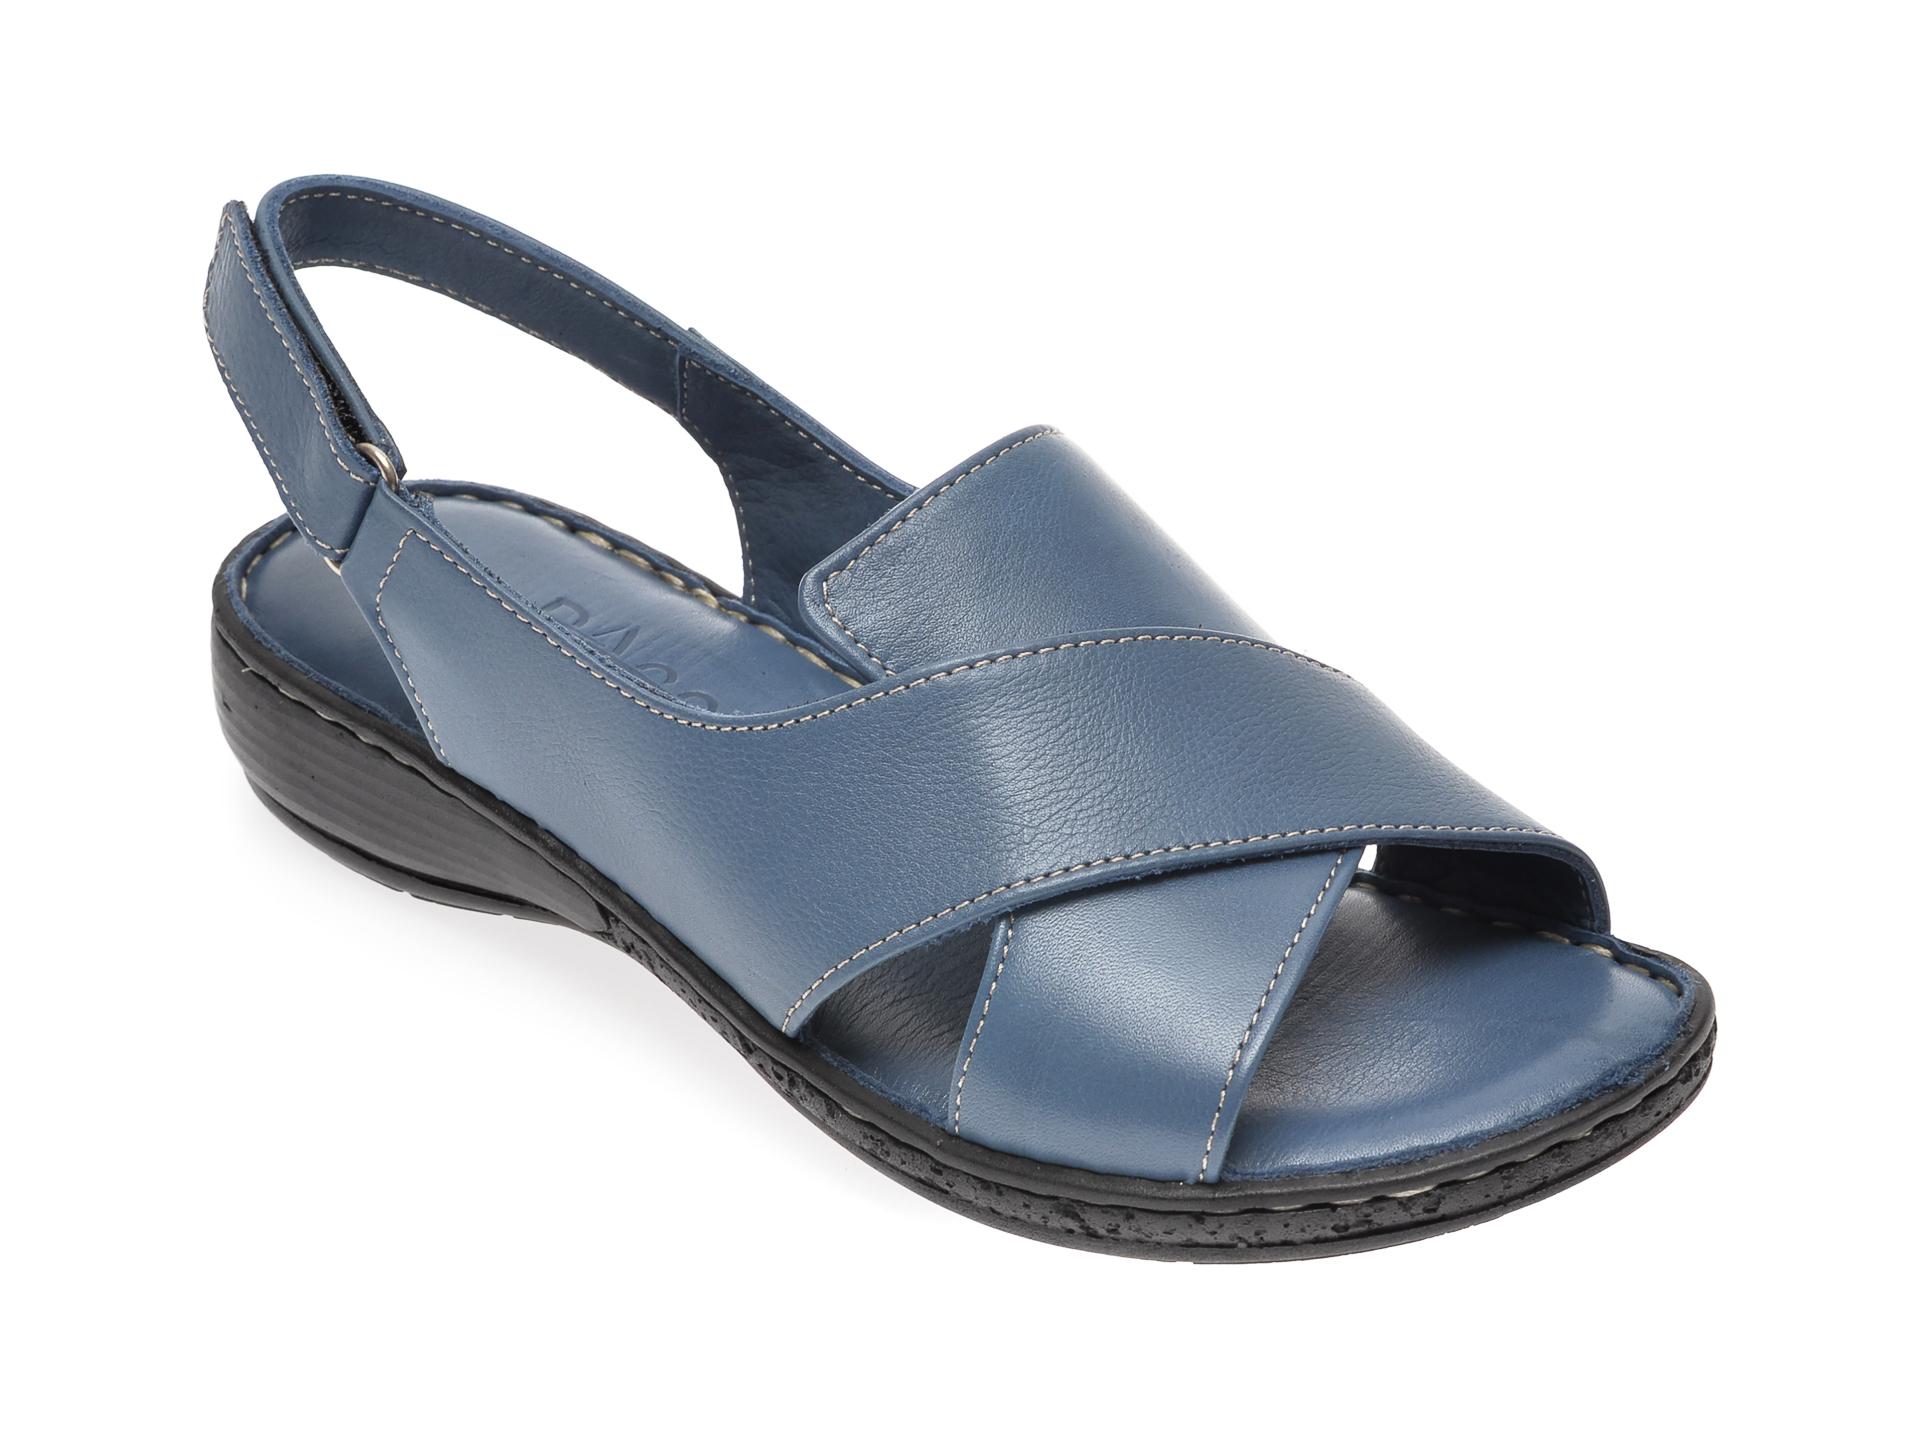 Sandale PASS COLLECTION albastre, 436, din piele naturala imagine